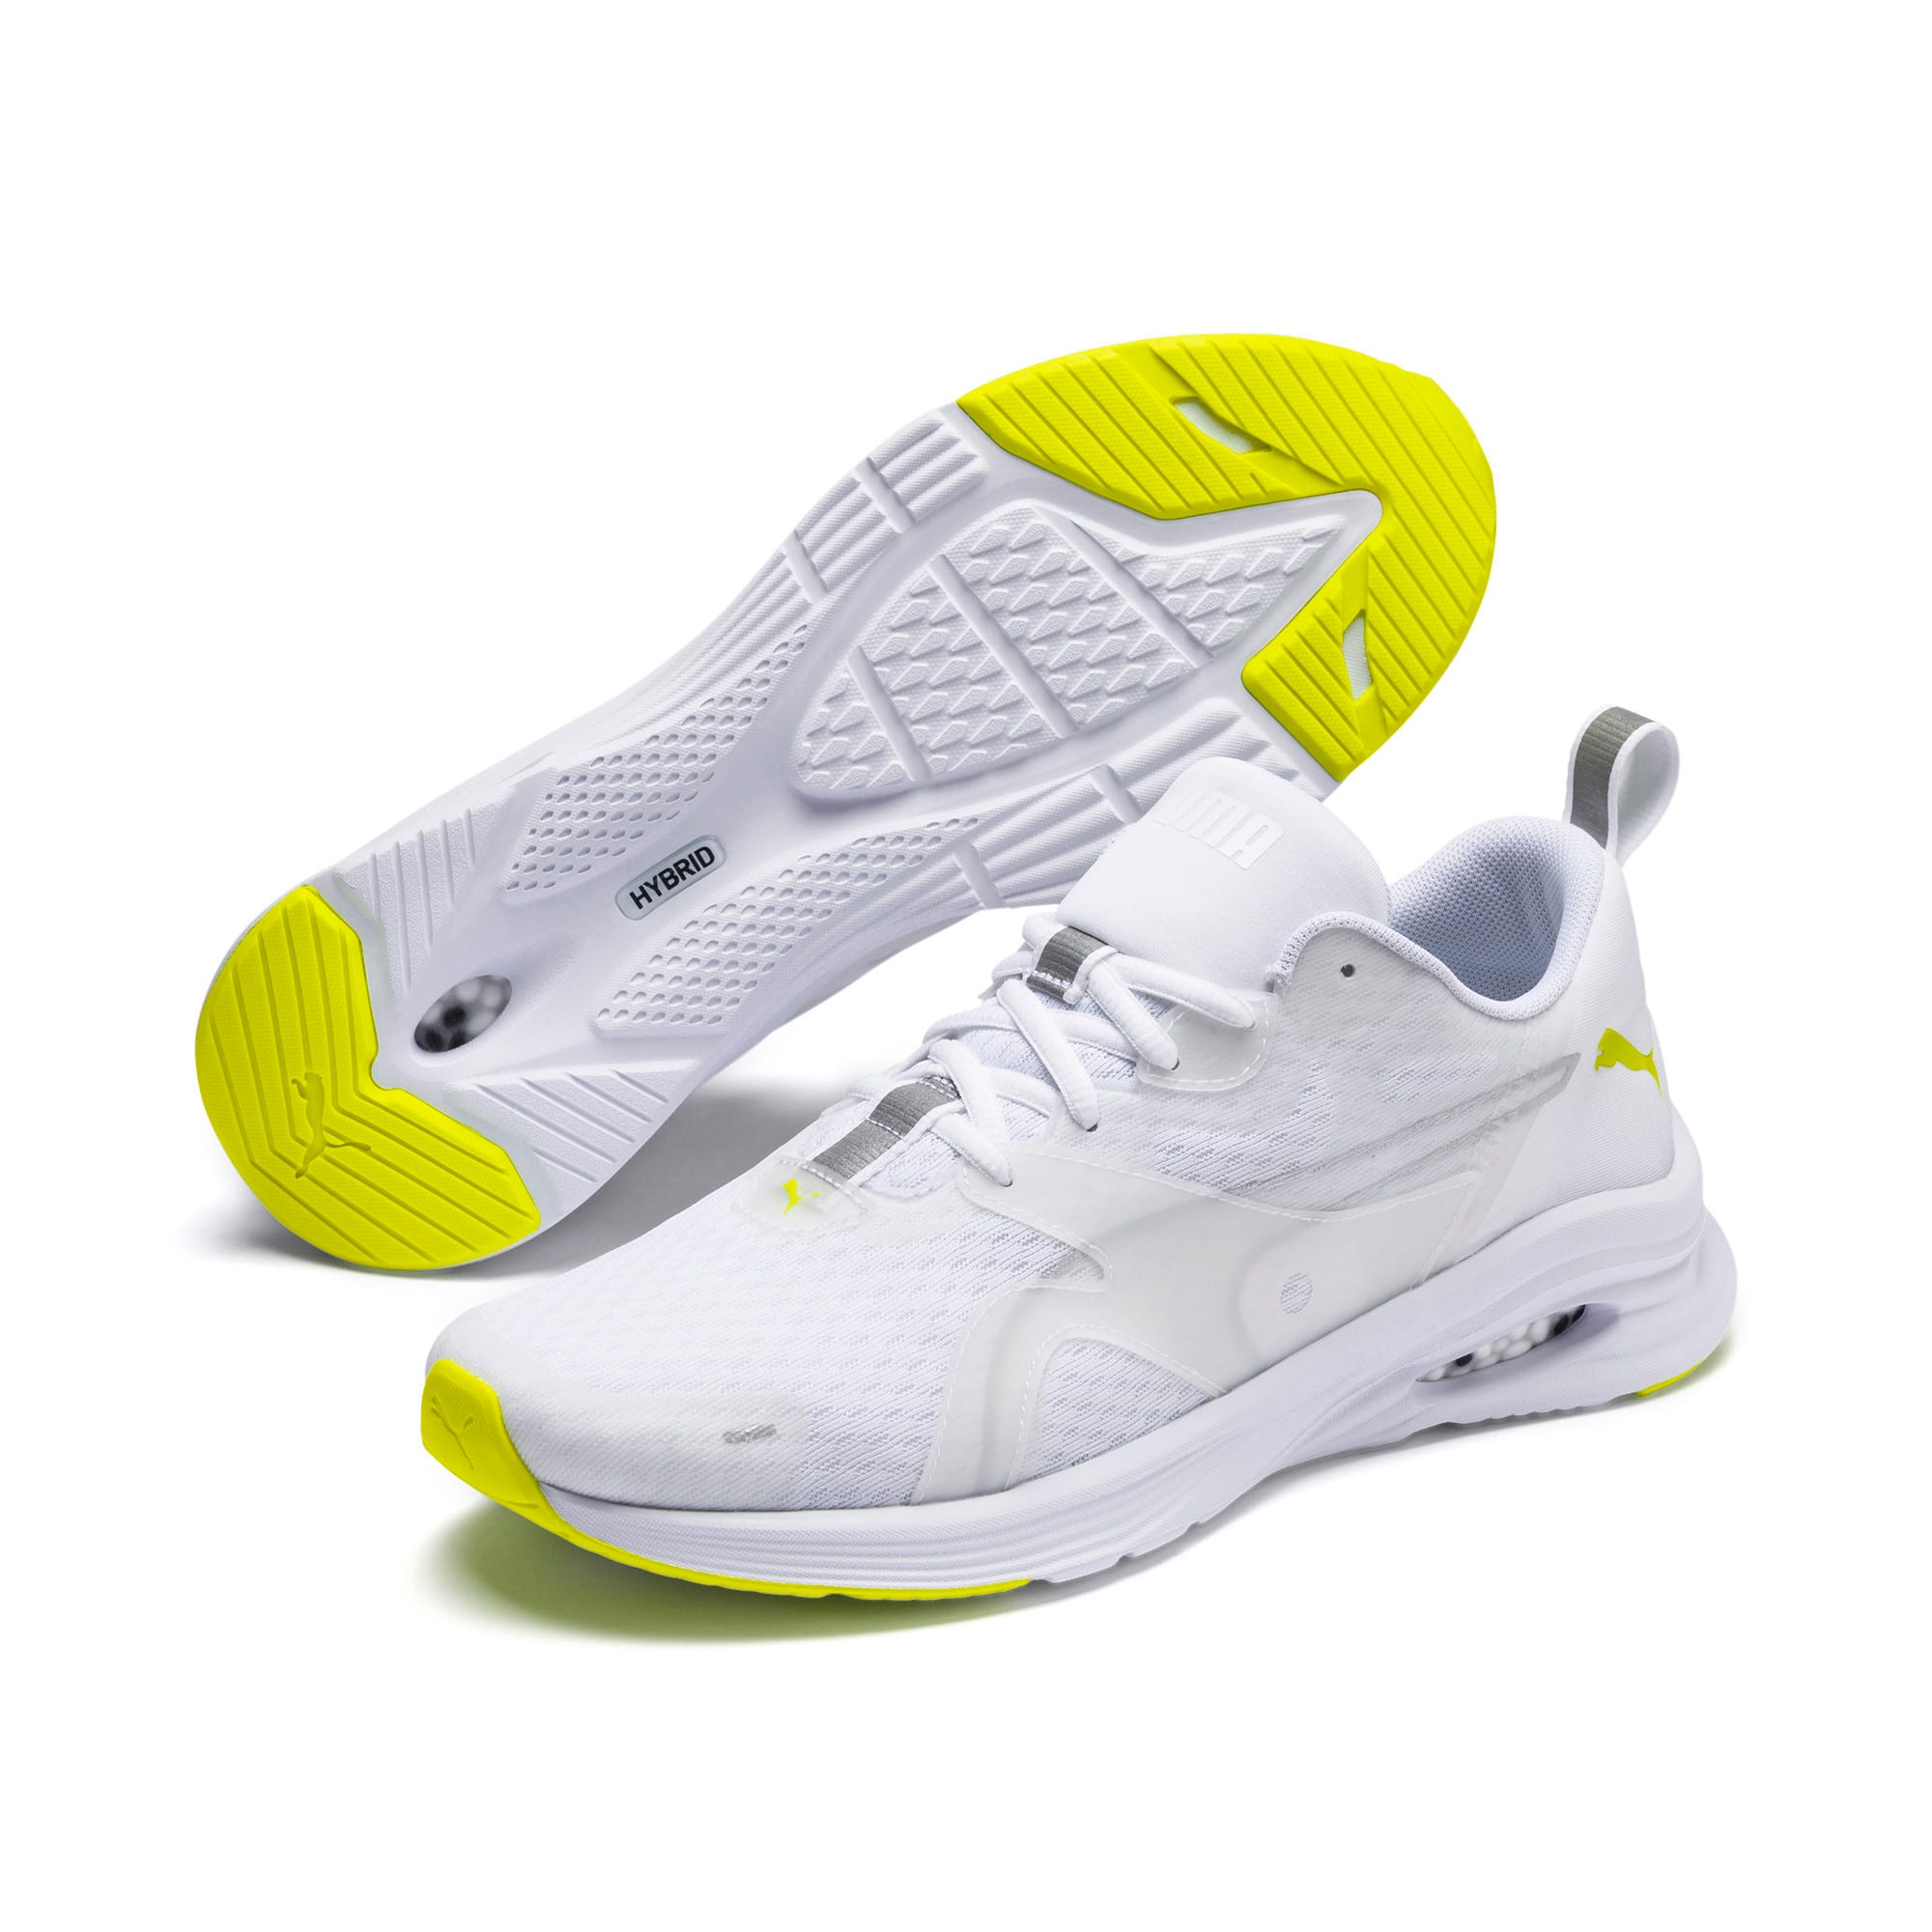 Thumbnail 3 of HYBRID Fuego Men's Running Shoes, Puma White-Yellow Alert, medium